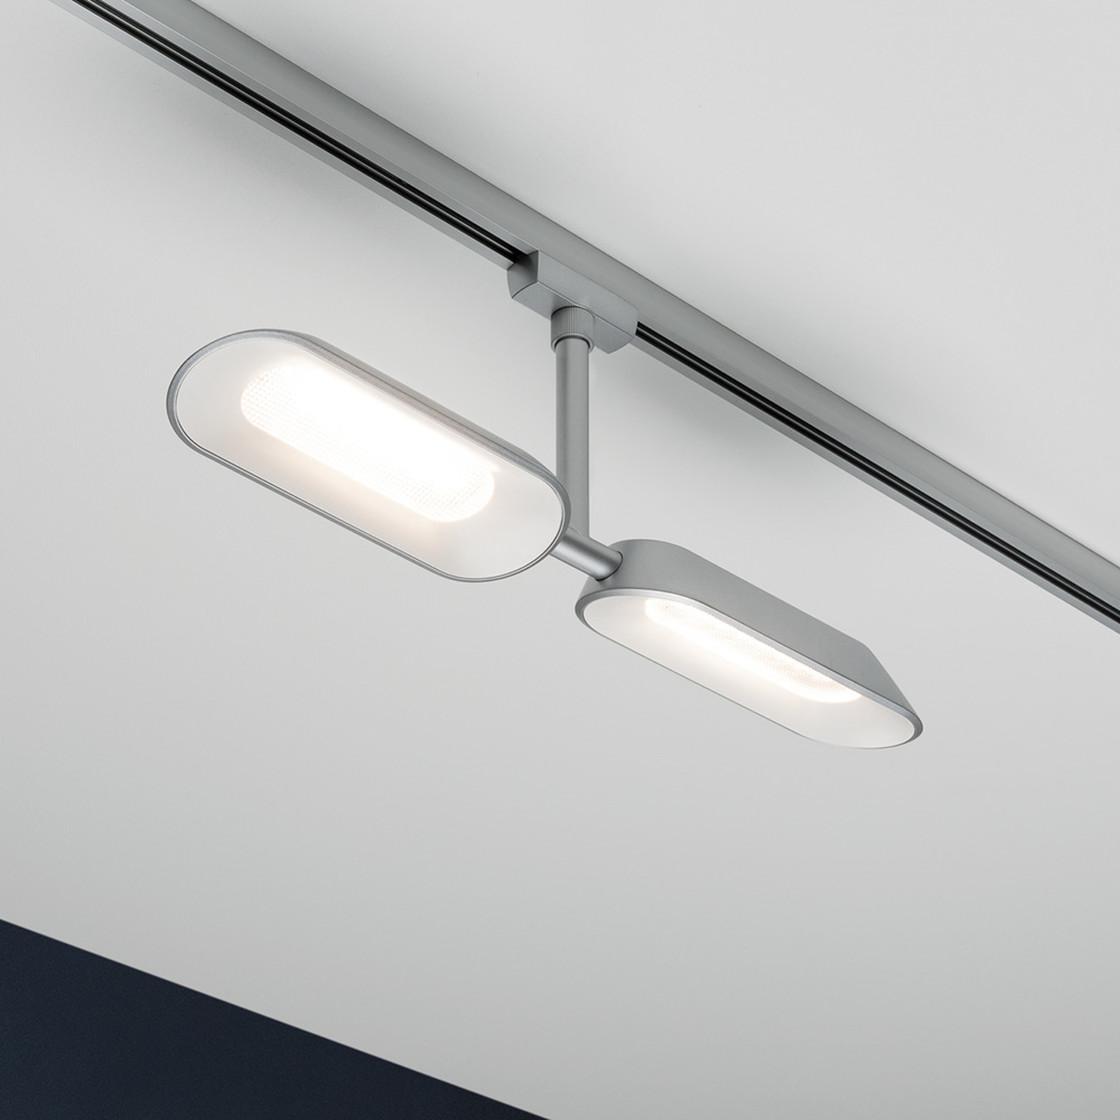 paulmann urail led spot dipper 2x8w chrom matt wei dimm. Black Bedroom Furniture Sets. Home Design Ideas